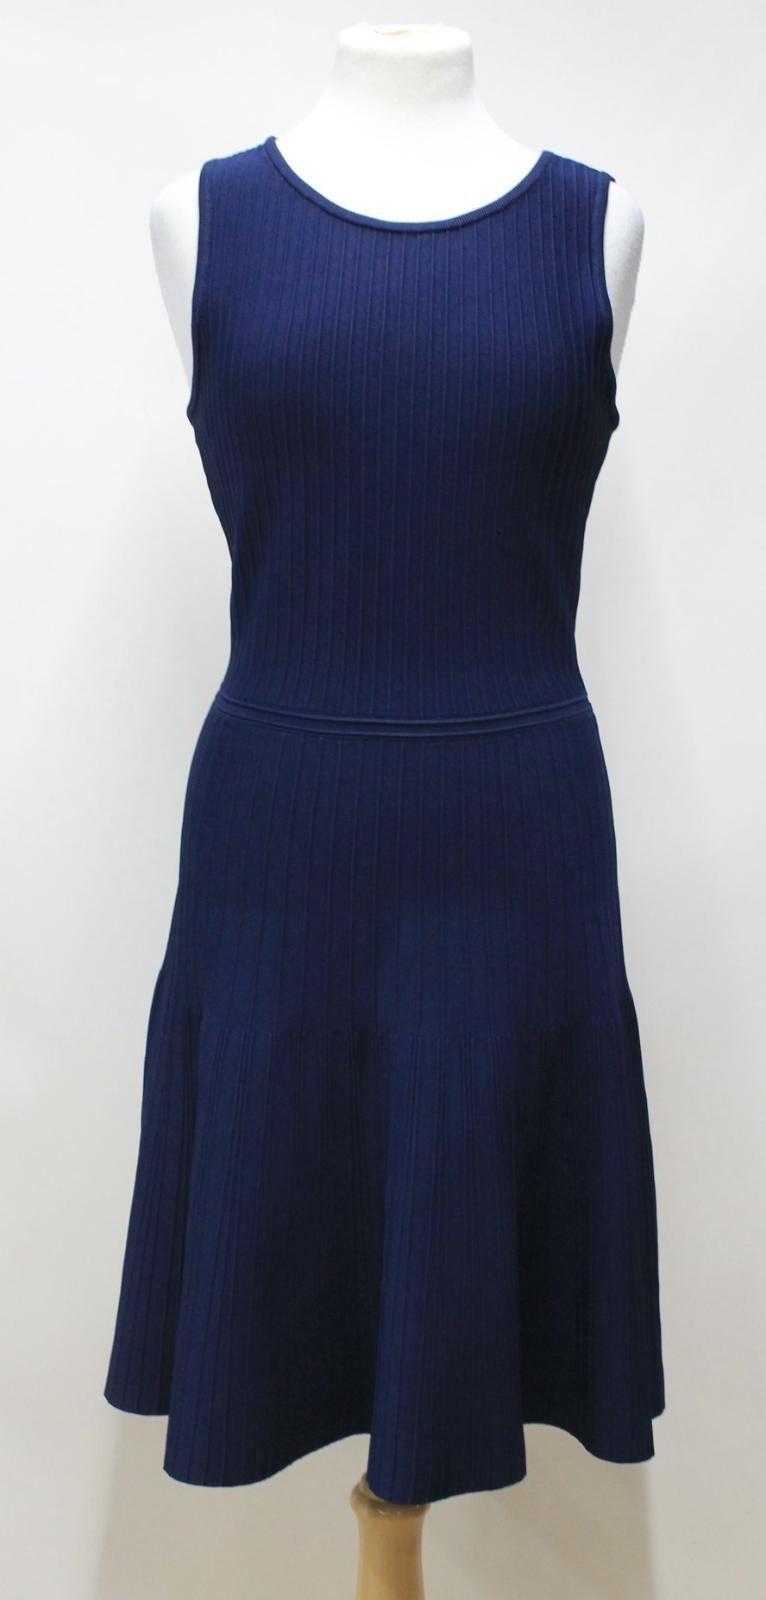 PINK-TARTAN-Ladies-Navy-Blue-Ribbed-Stretch-Sleeveless-A-Line-Dress-Size-S